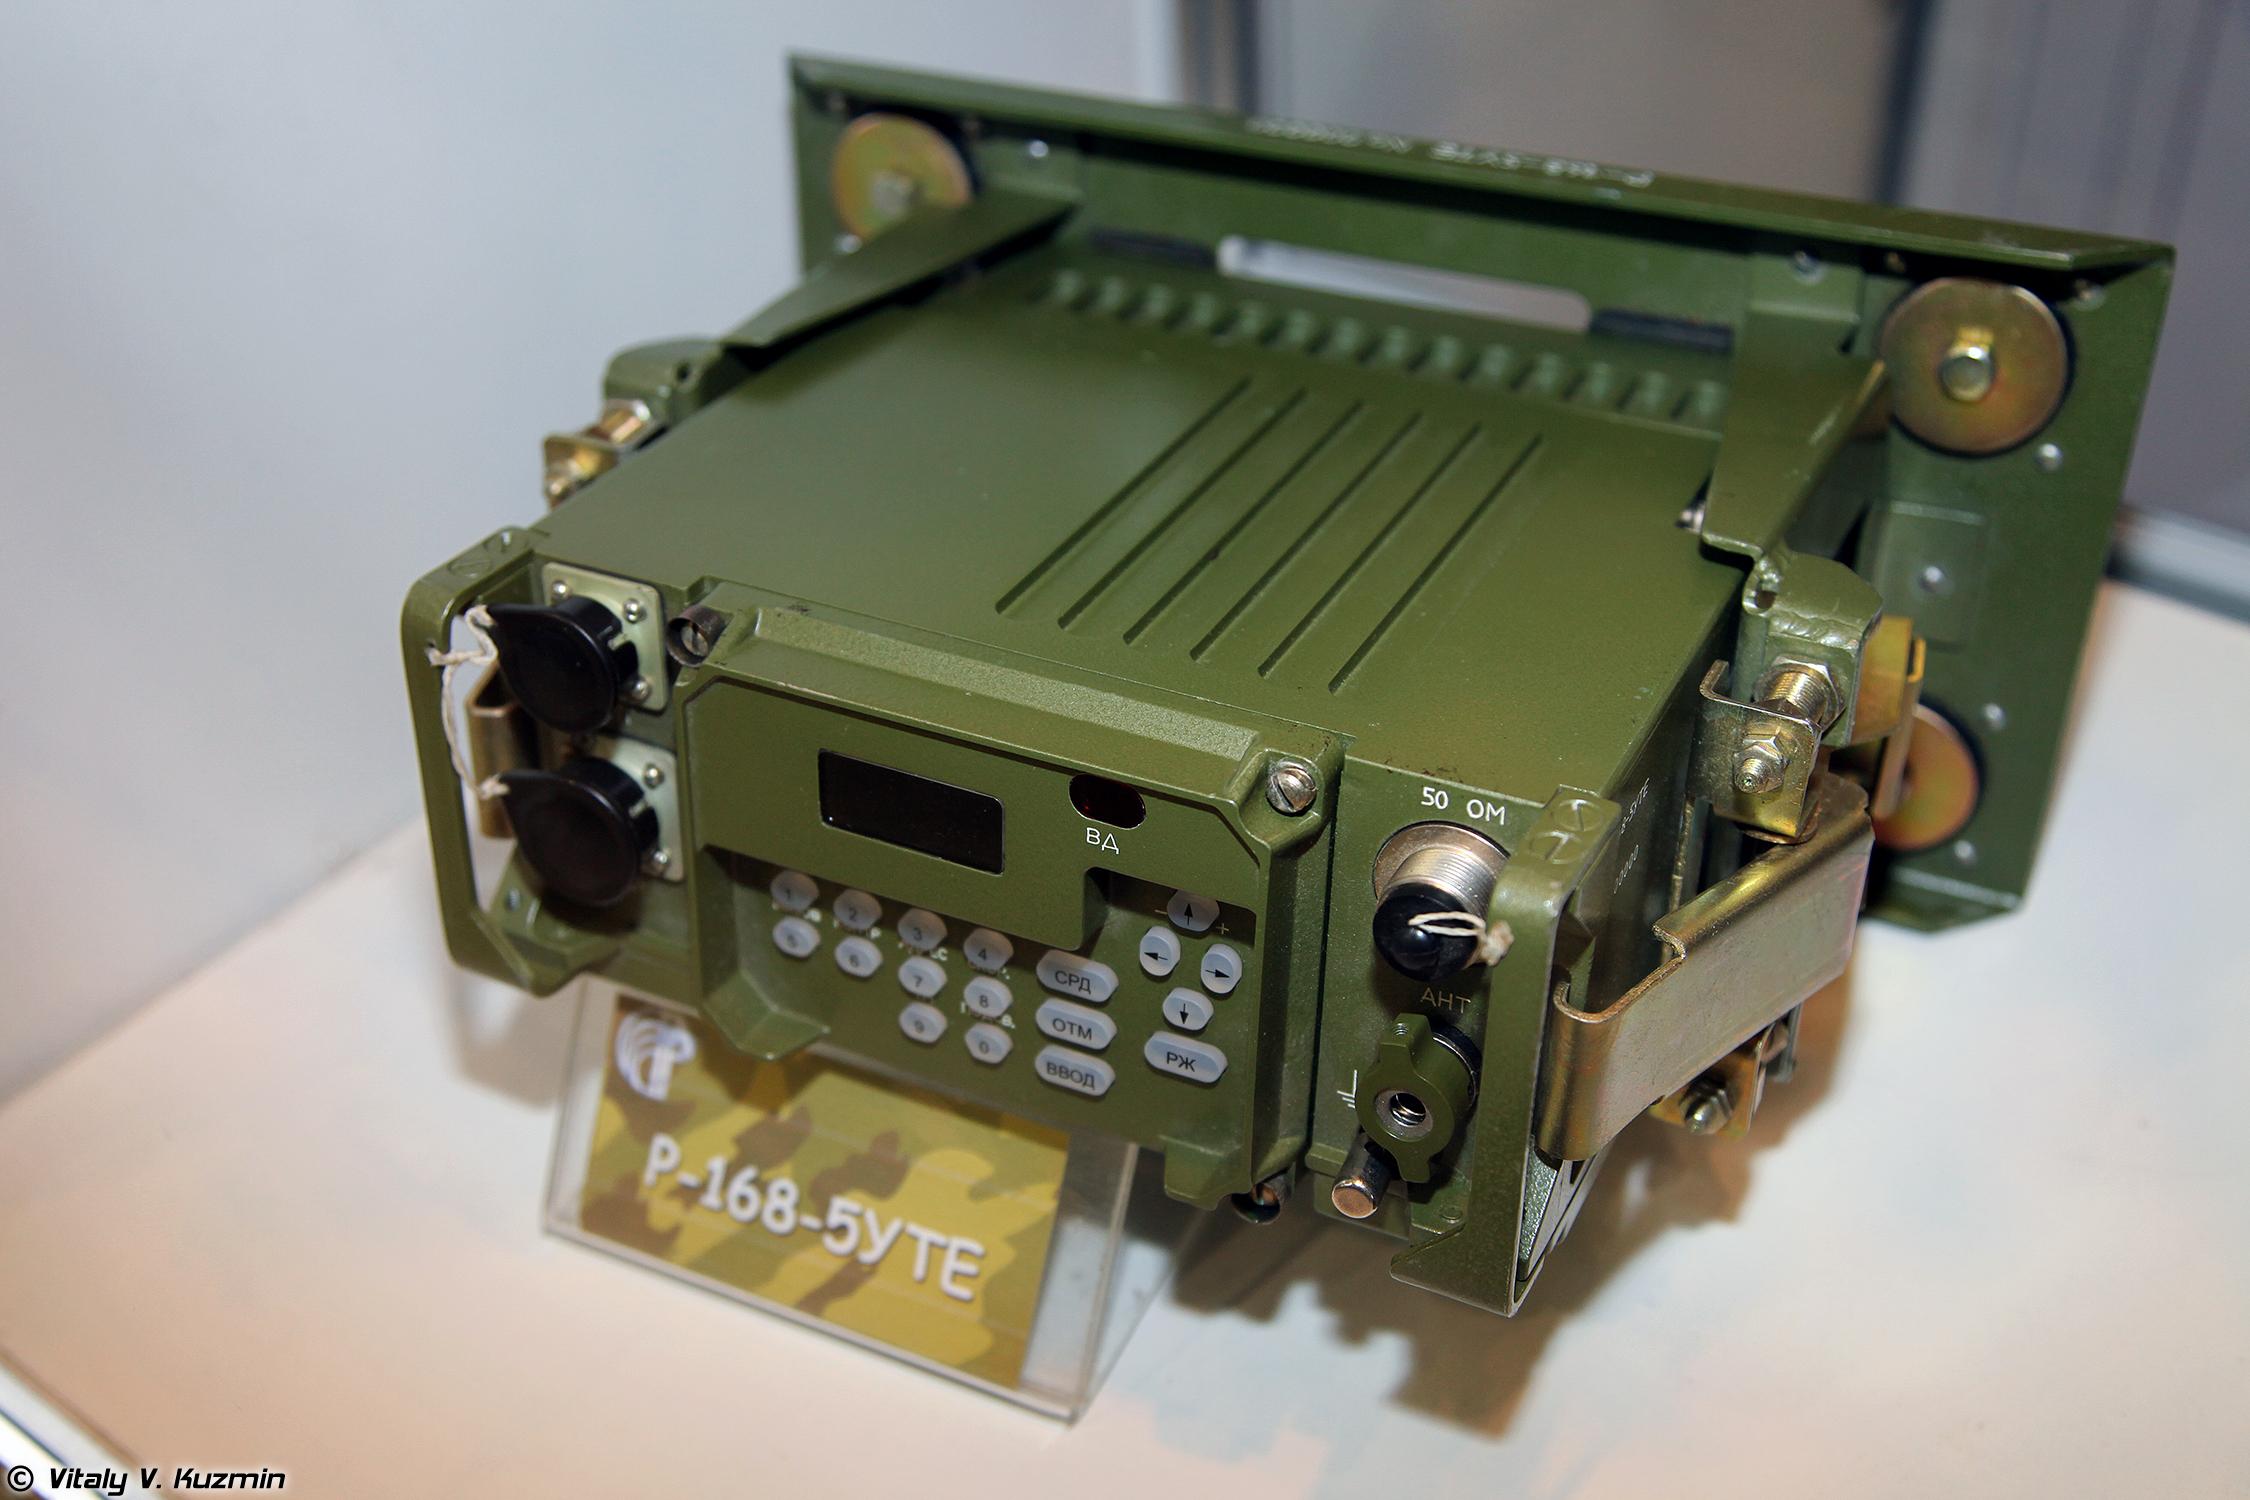 http://77rus.smugmug.com/Military/Interpolitex-2013/i-6MvGF5m/0/O/Interpolitex2013part07-02.jpg